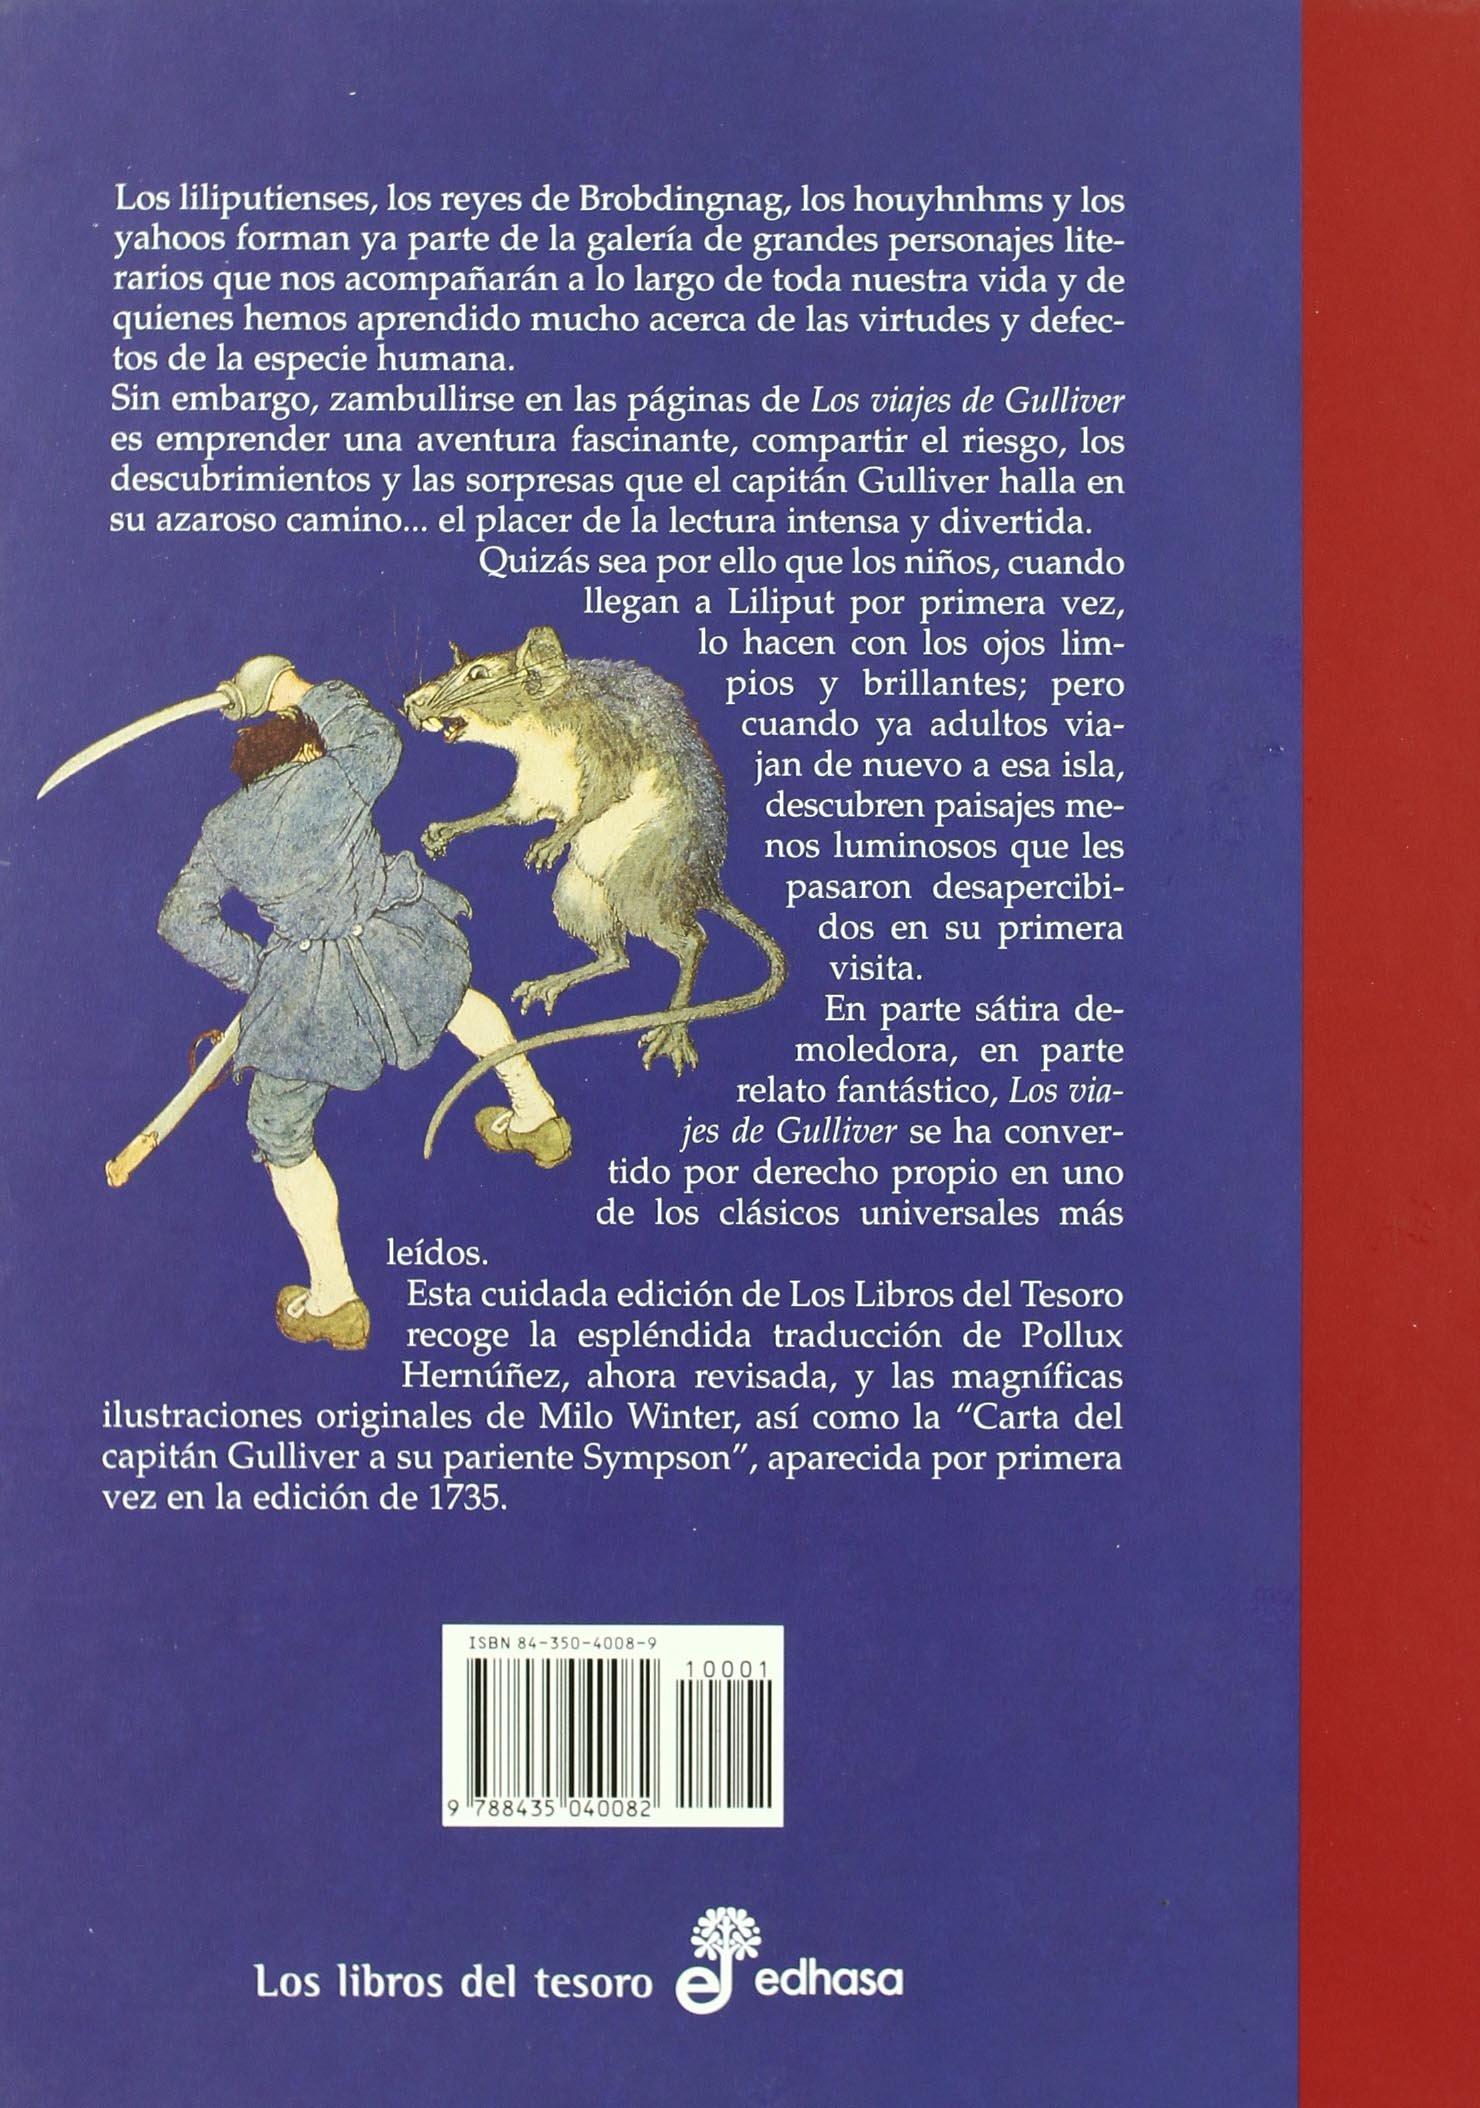 Los Viajes de Gulliver (Spanish Edition) by Edhasa (Image #2)